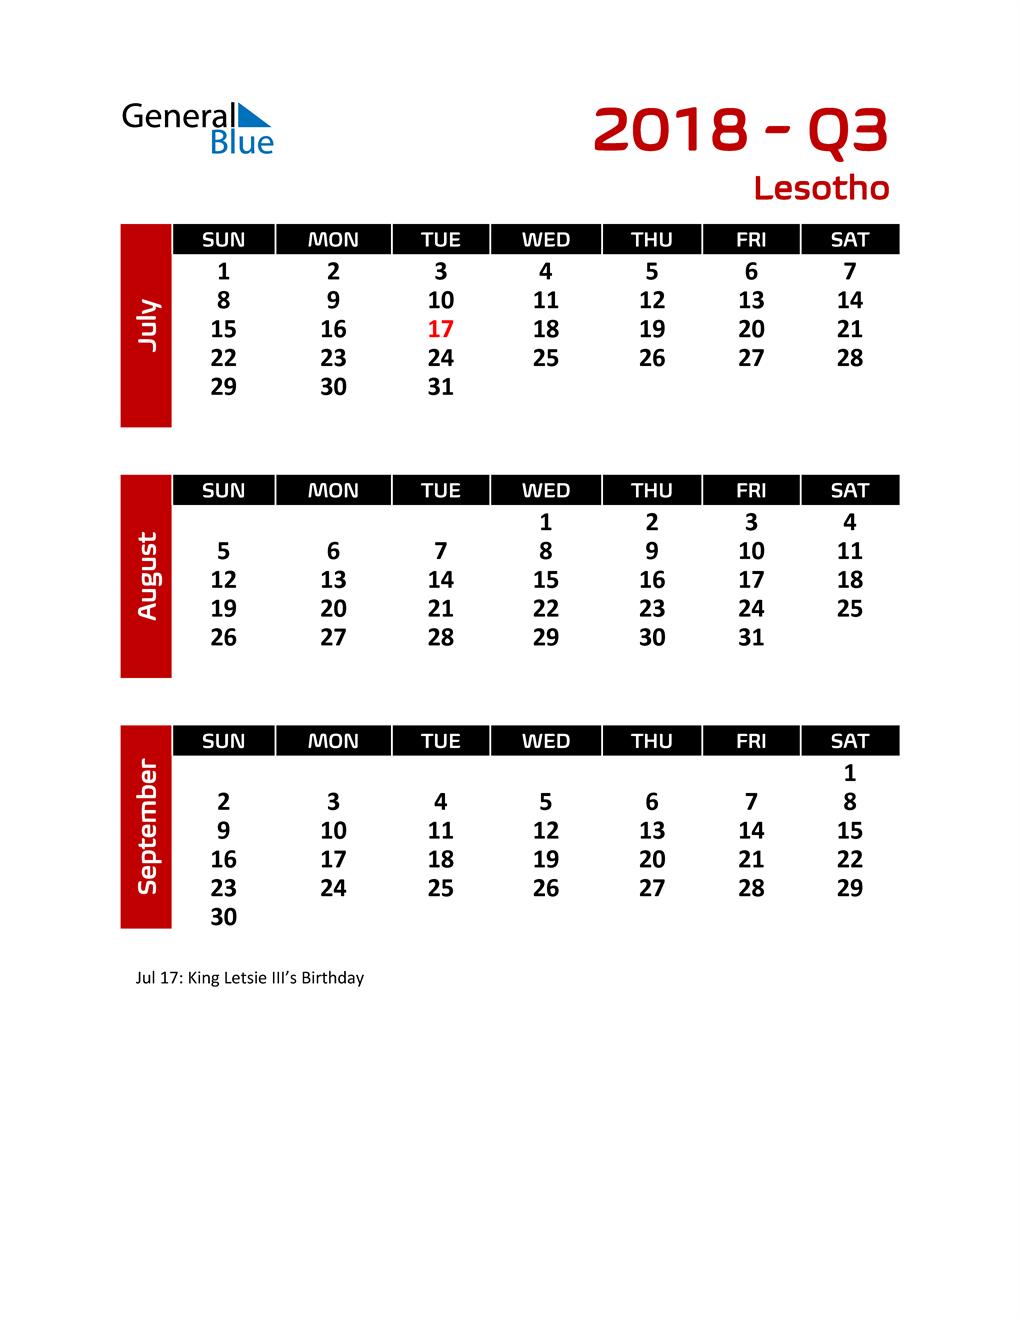 Q3 2018 Calendar with Holidays